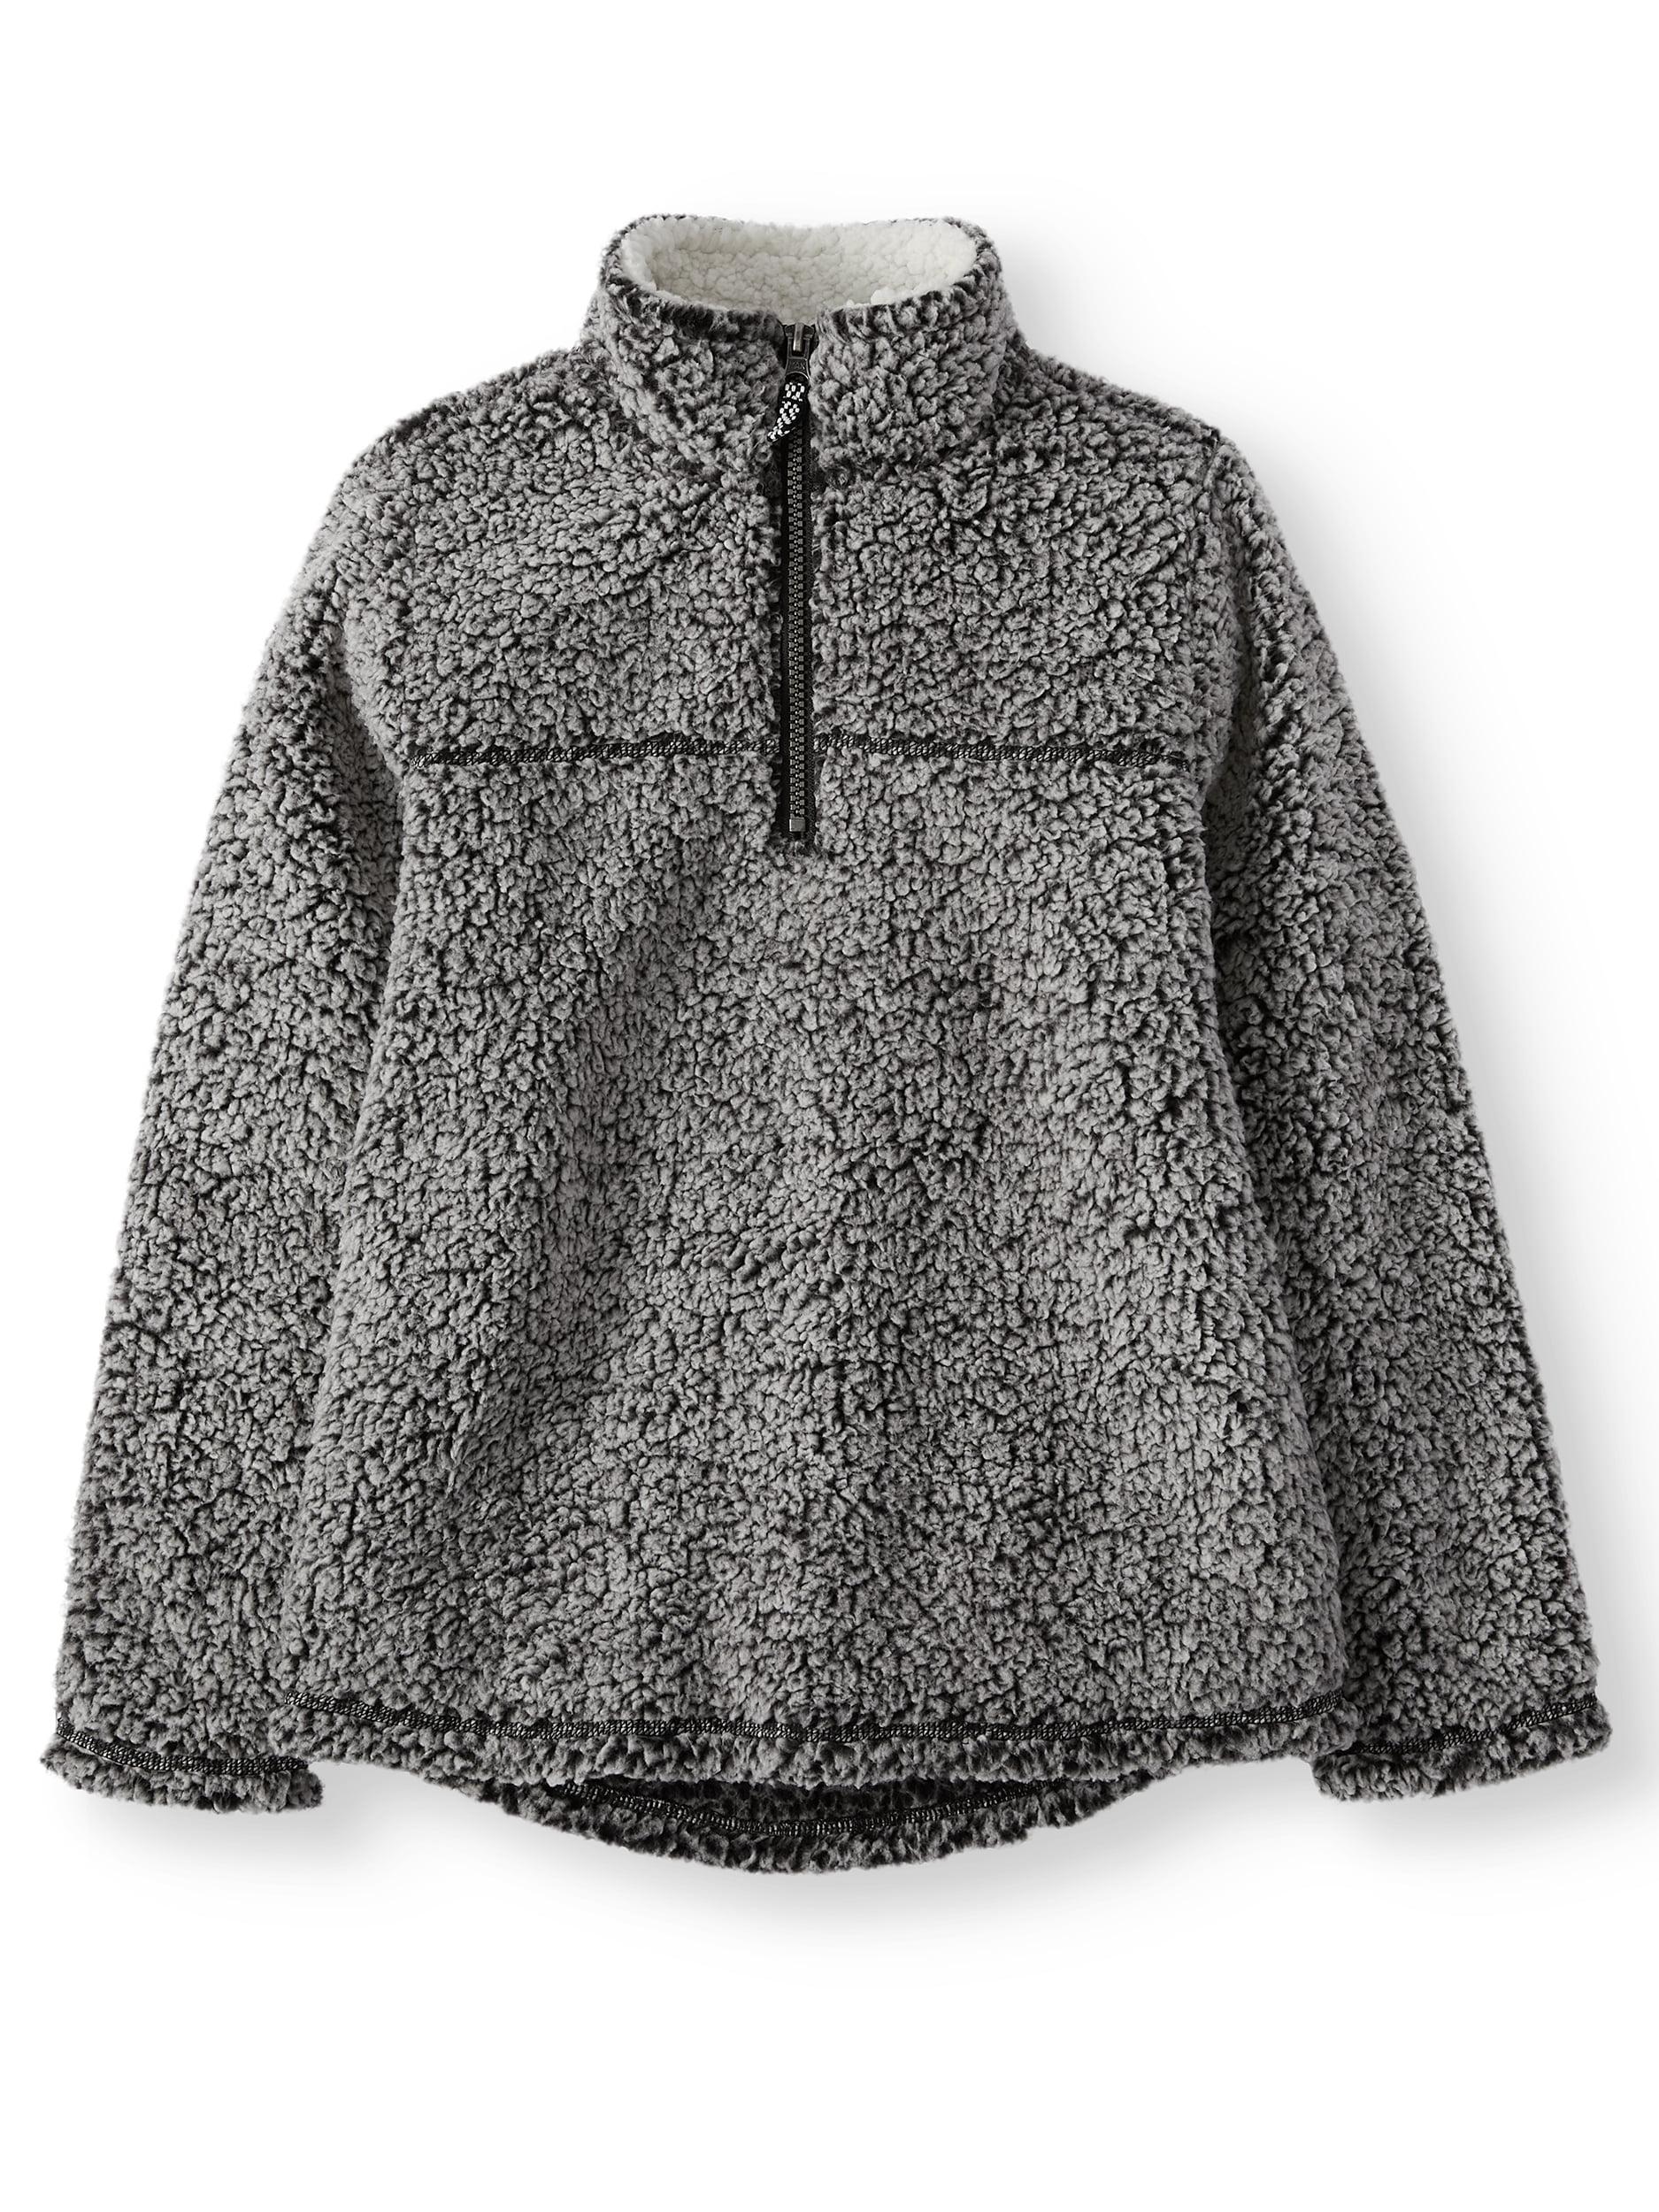 Mock Neck Quarter Zip Boucle Lined Sherpa Jacket (Toddler Boys)